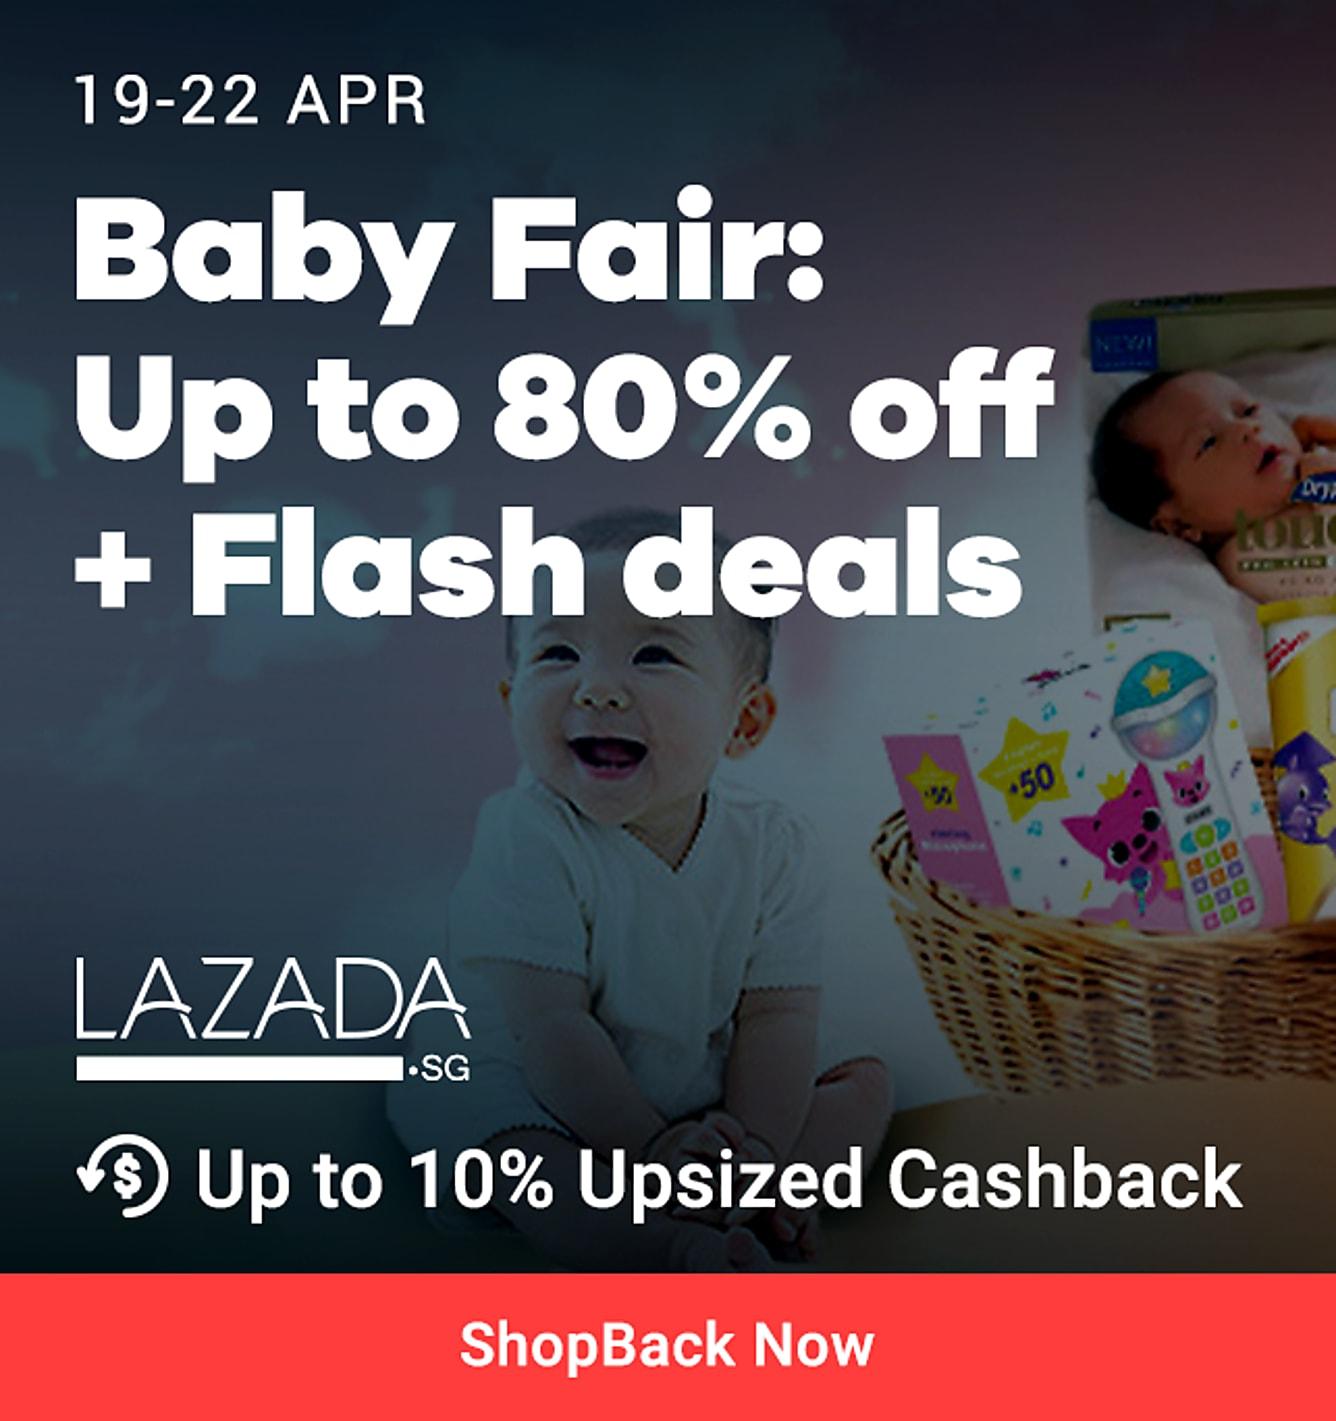 Baby Fair 80% off 10% upsized cashback